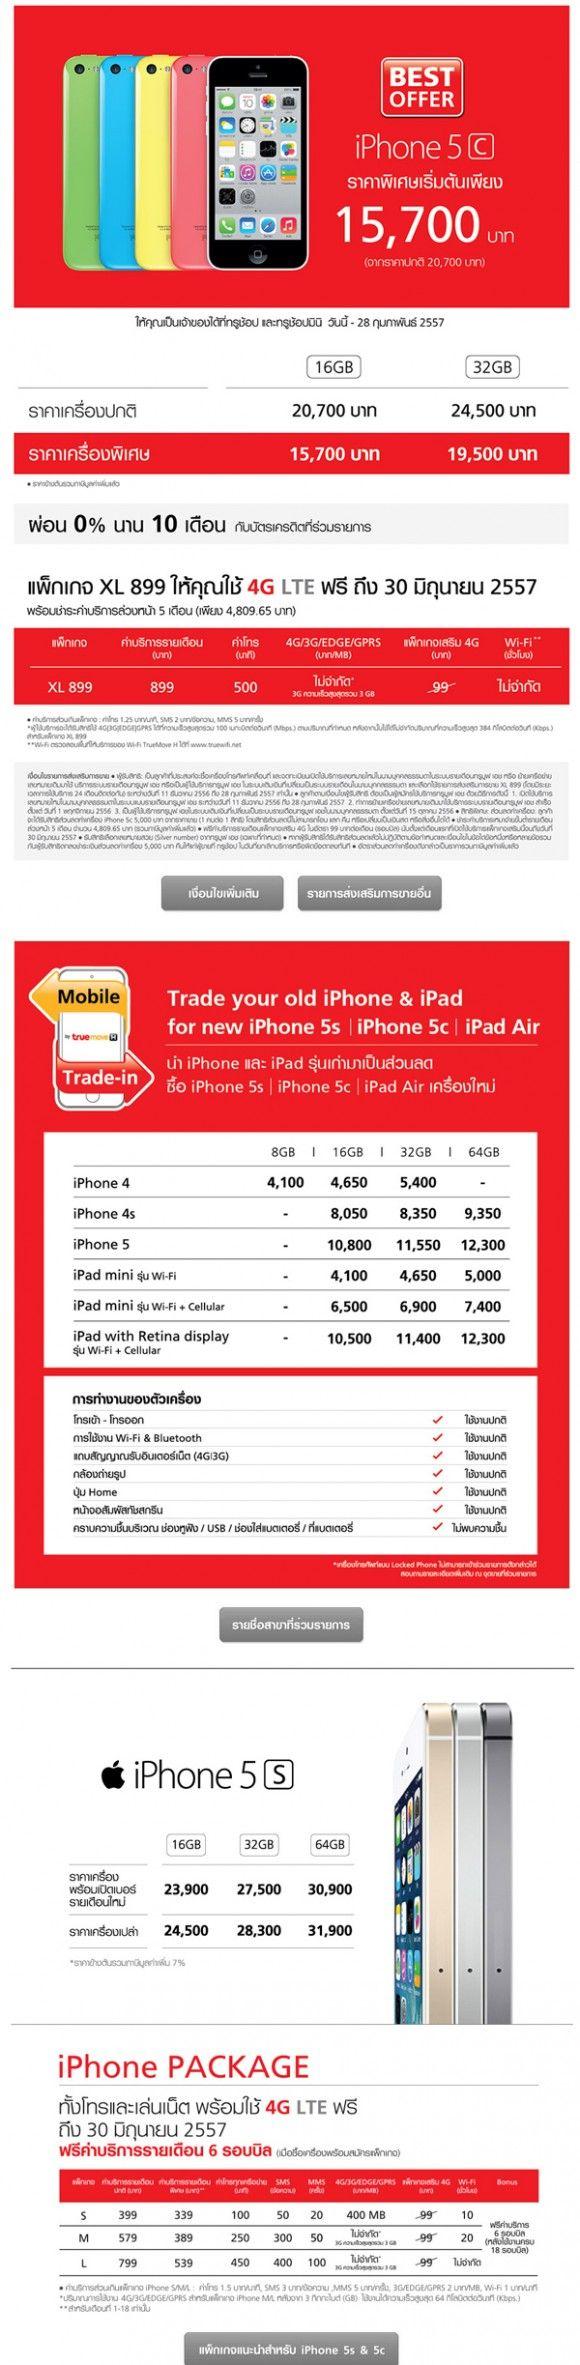 iPhone & iPad เก่าแลกซื้อ iPhone 5c l iPhone 5s l iPad Air กับ TrueMove H